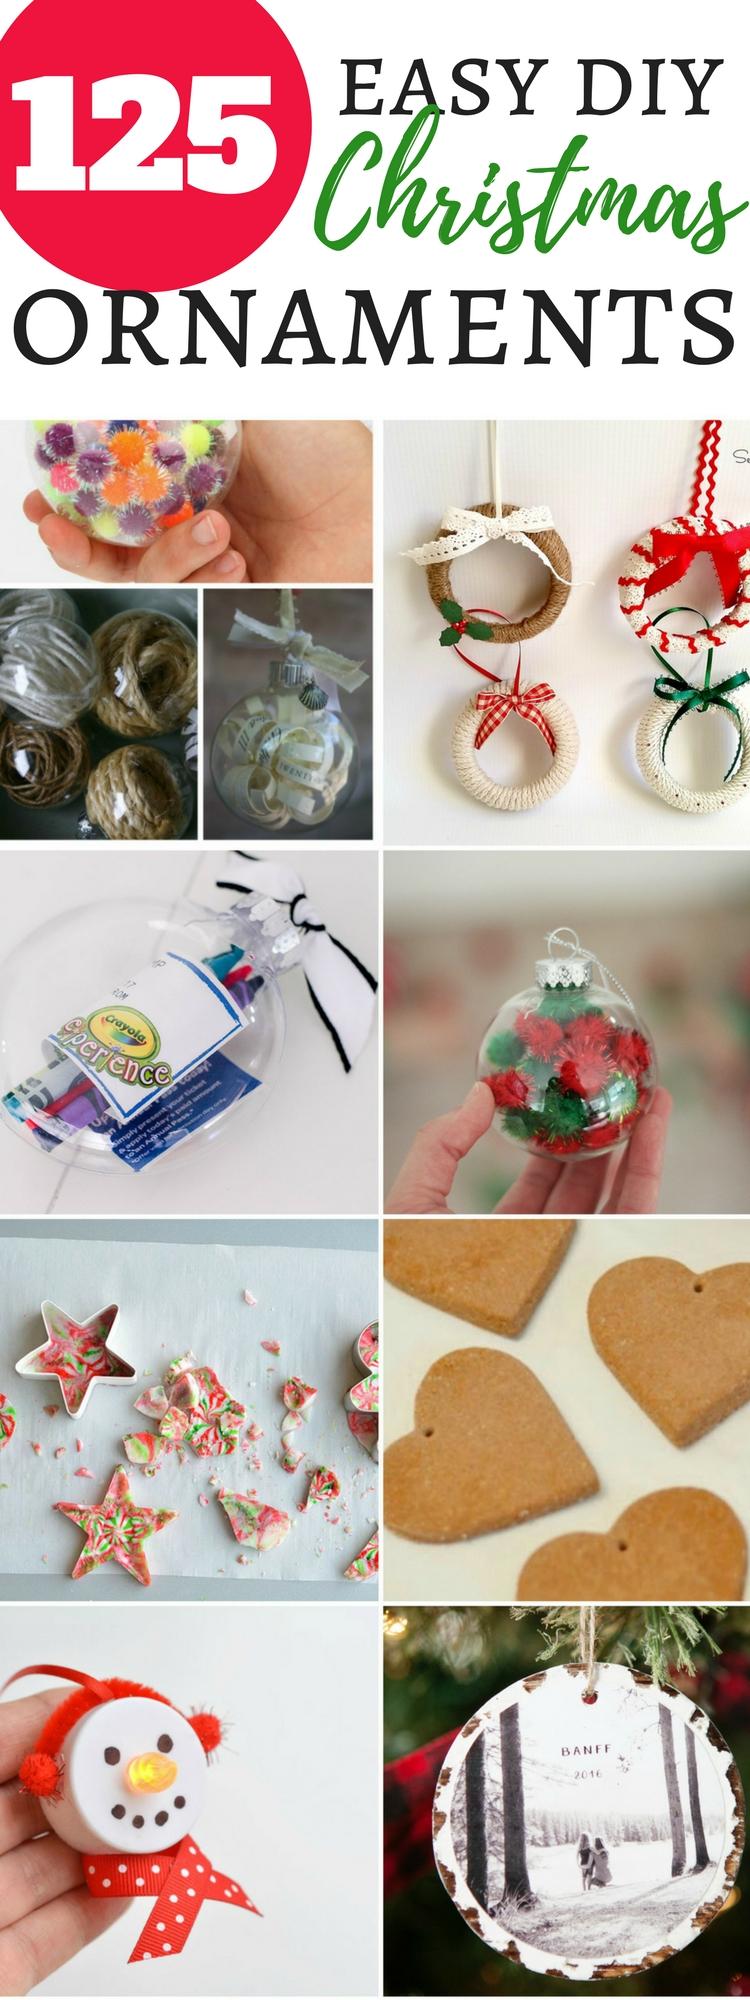 125 easy DIY Christmas ornaments